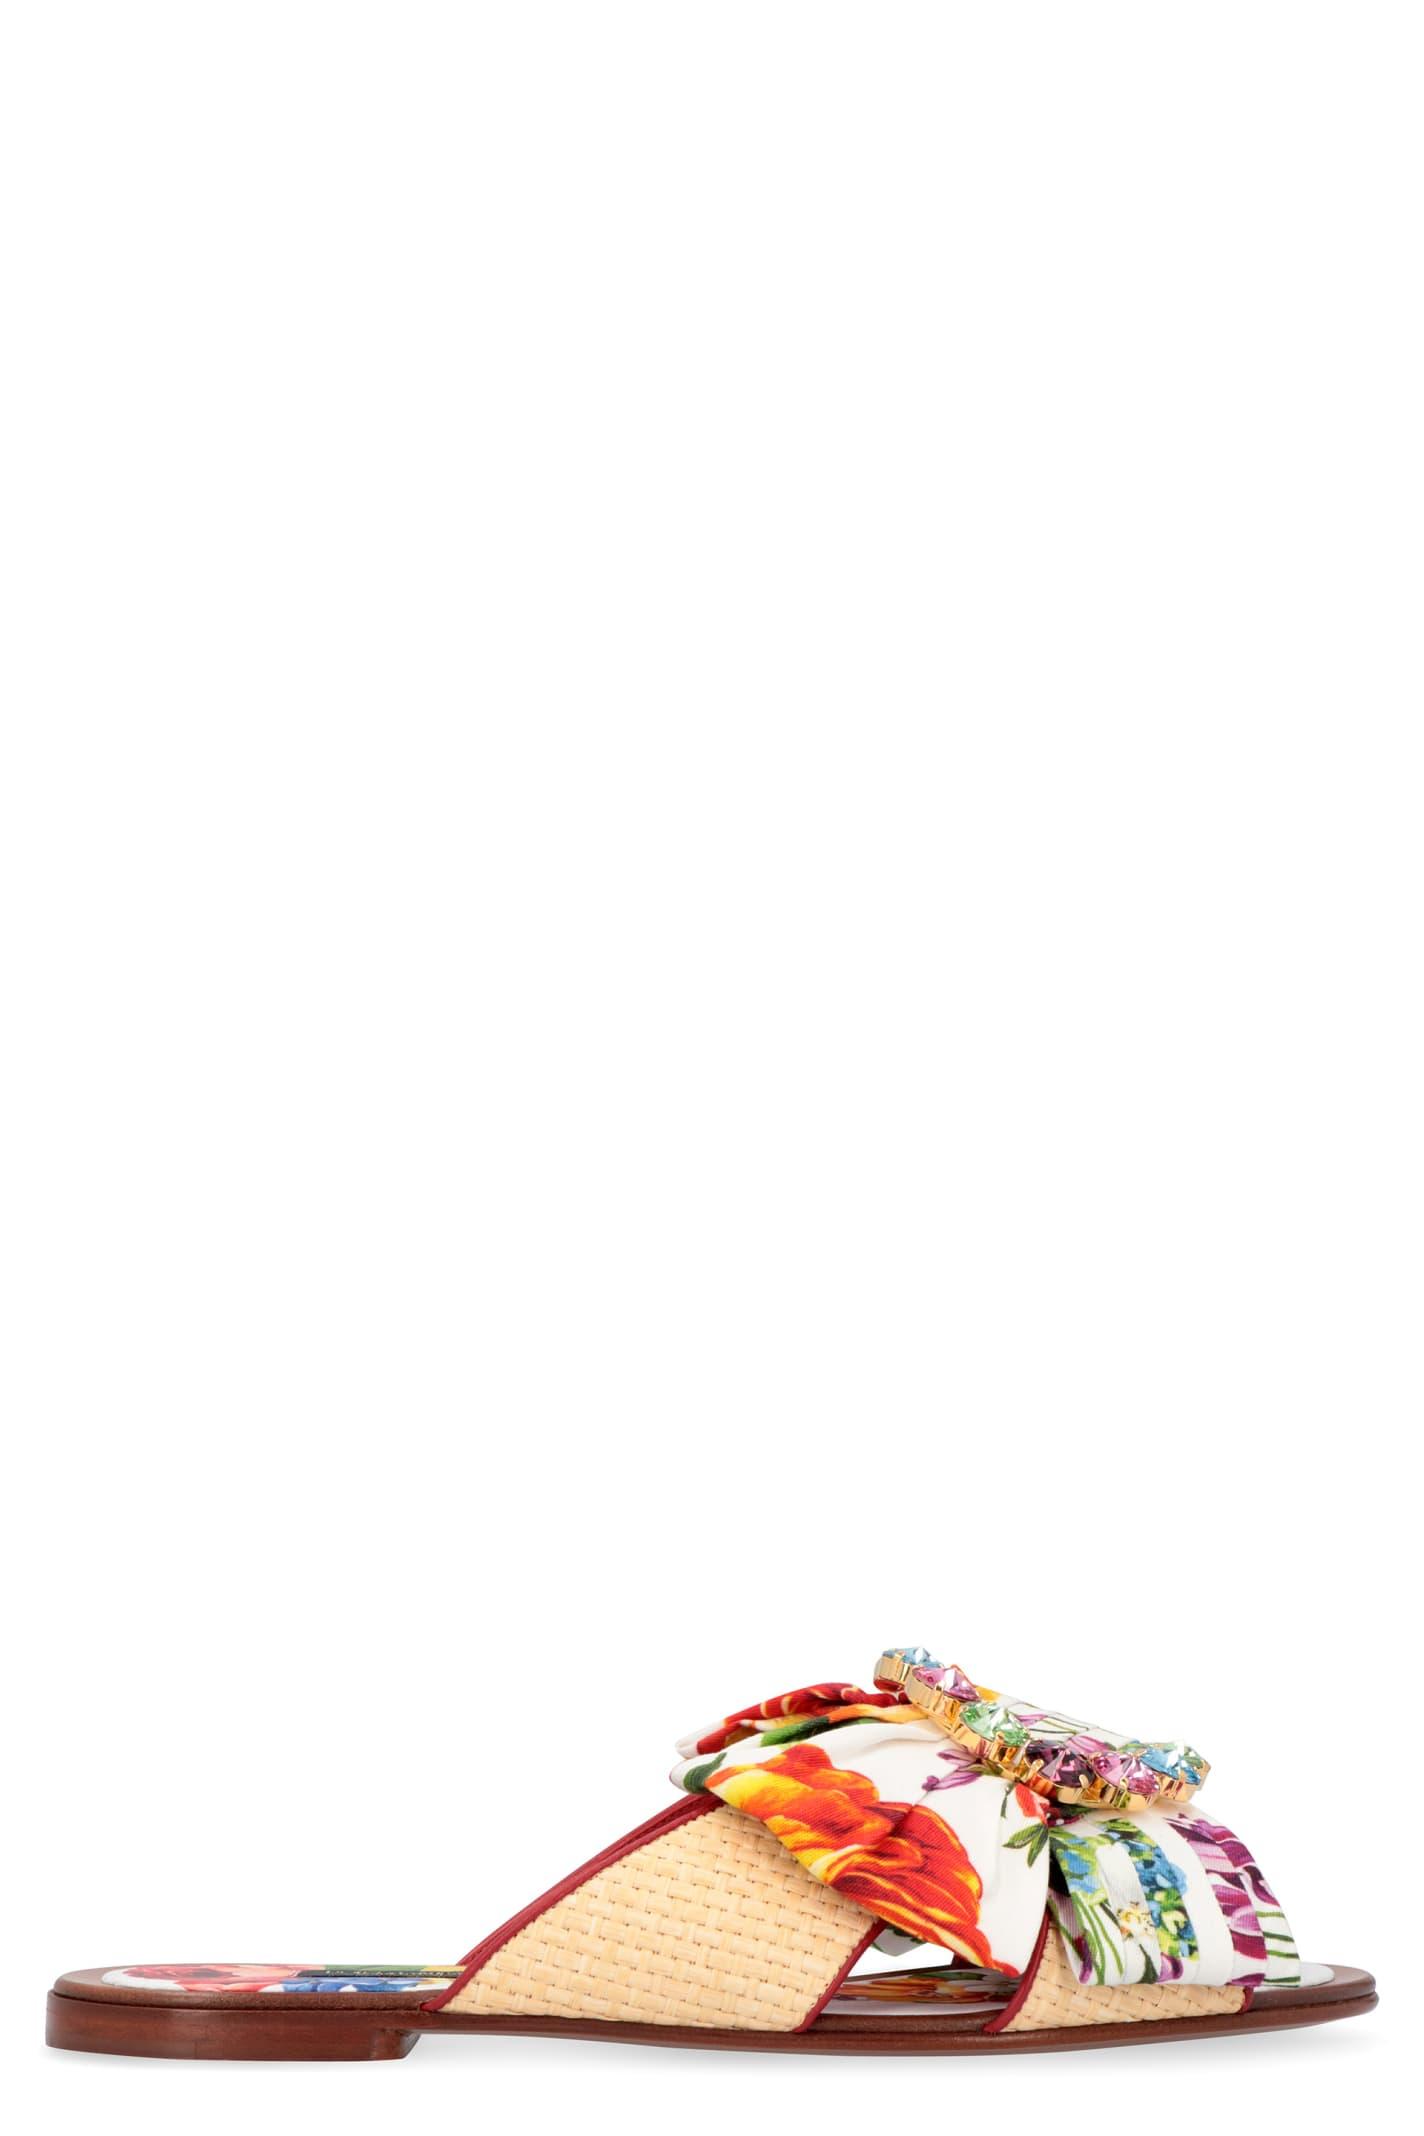 Dolce & Gabbana Embellished Buckle Flat Sandals In Multicolor